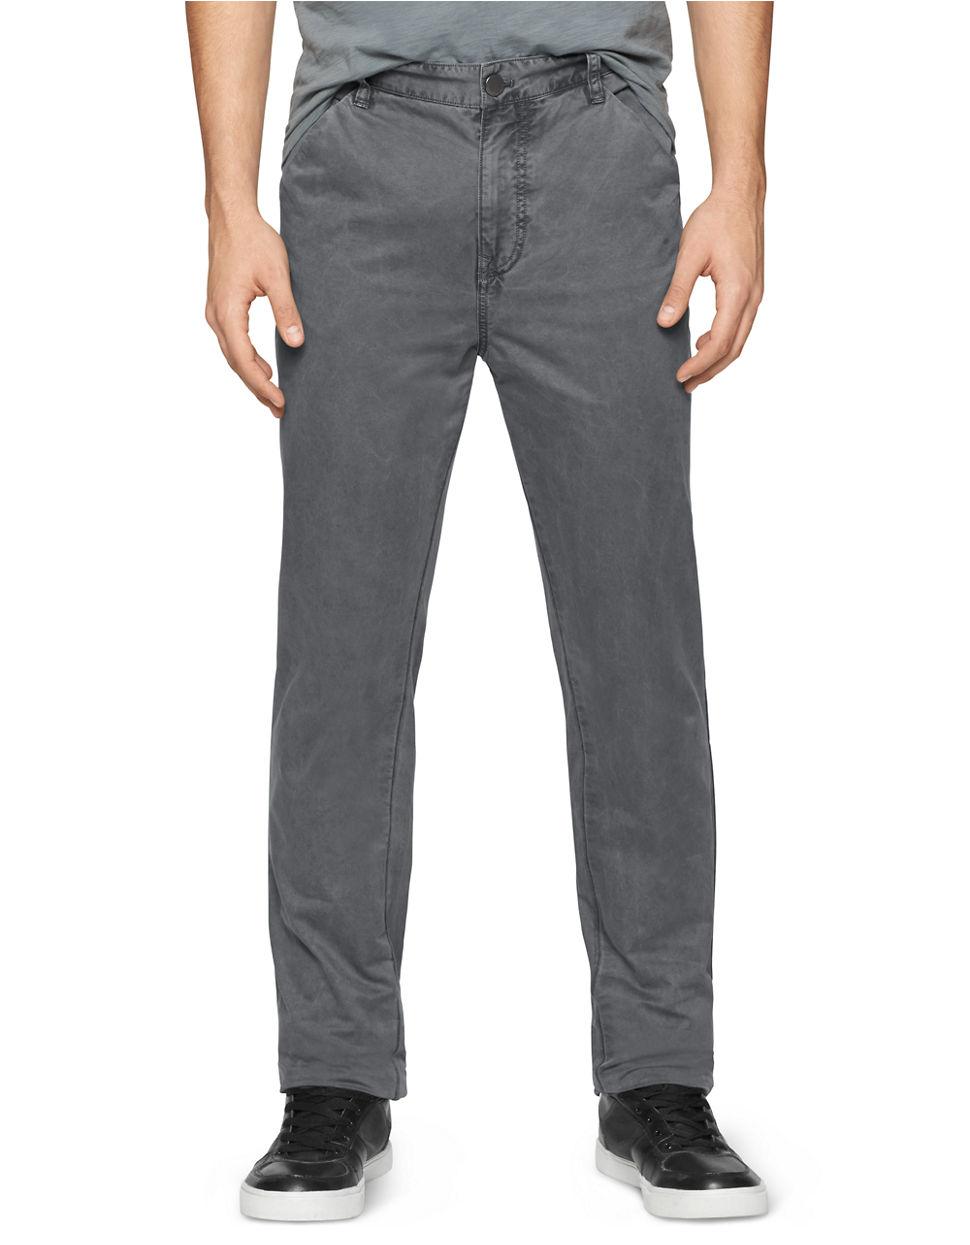 calvin klein jeans slim straight trouser pants in gray for. Black Bedroom Furniture Sets. Home Design Ideas